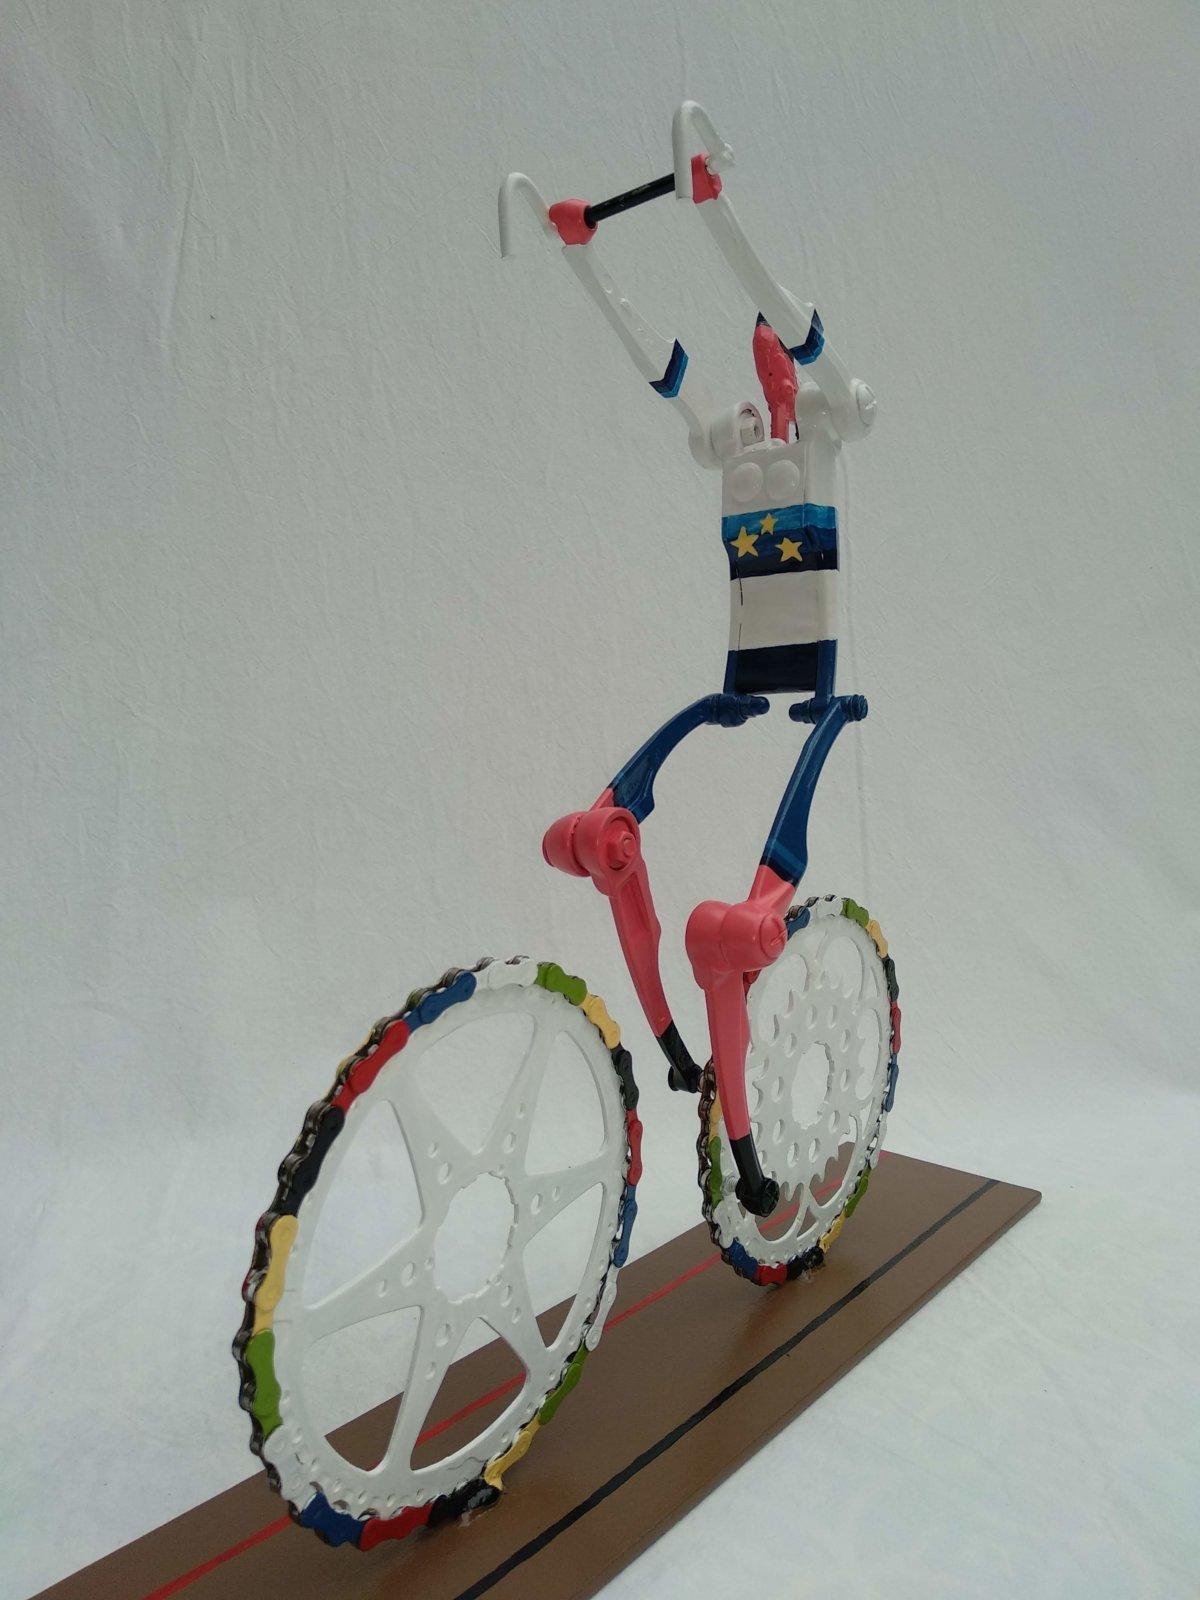 Victorie In Alkmaar European Champion Road Cycling Art By Decreatievelink